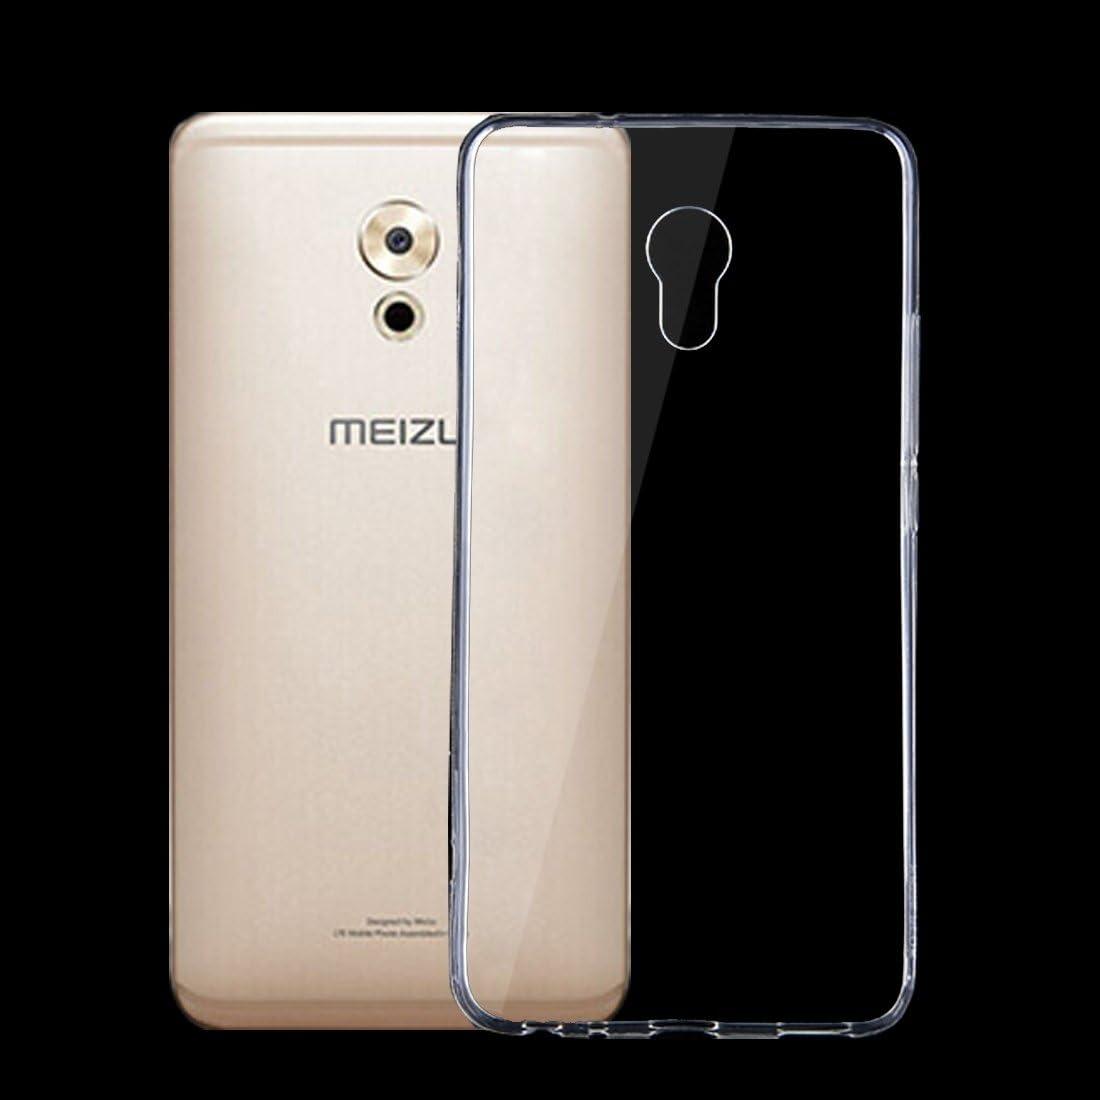 Holster Fundas y Estuches para teléfonos móviles, 50 PCS Meizu Pro ...